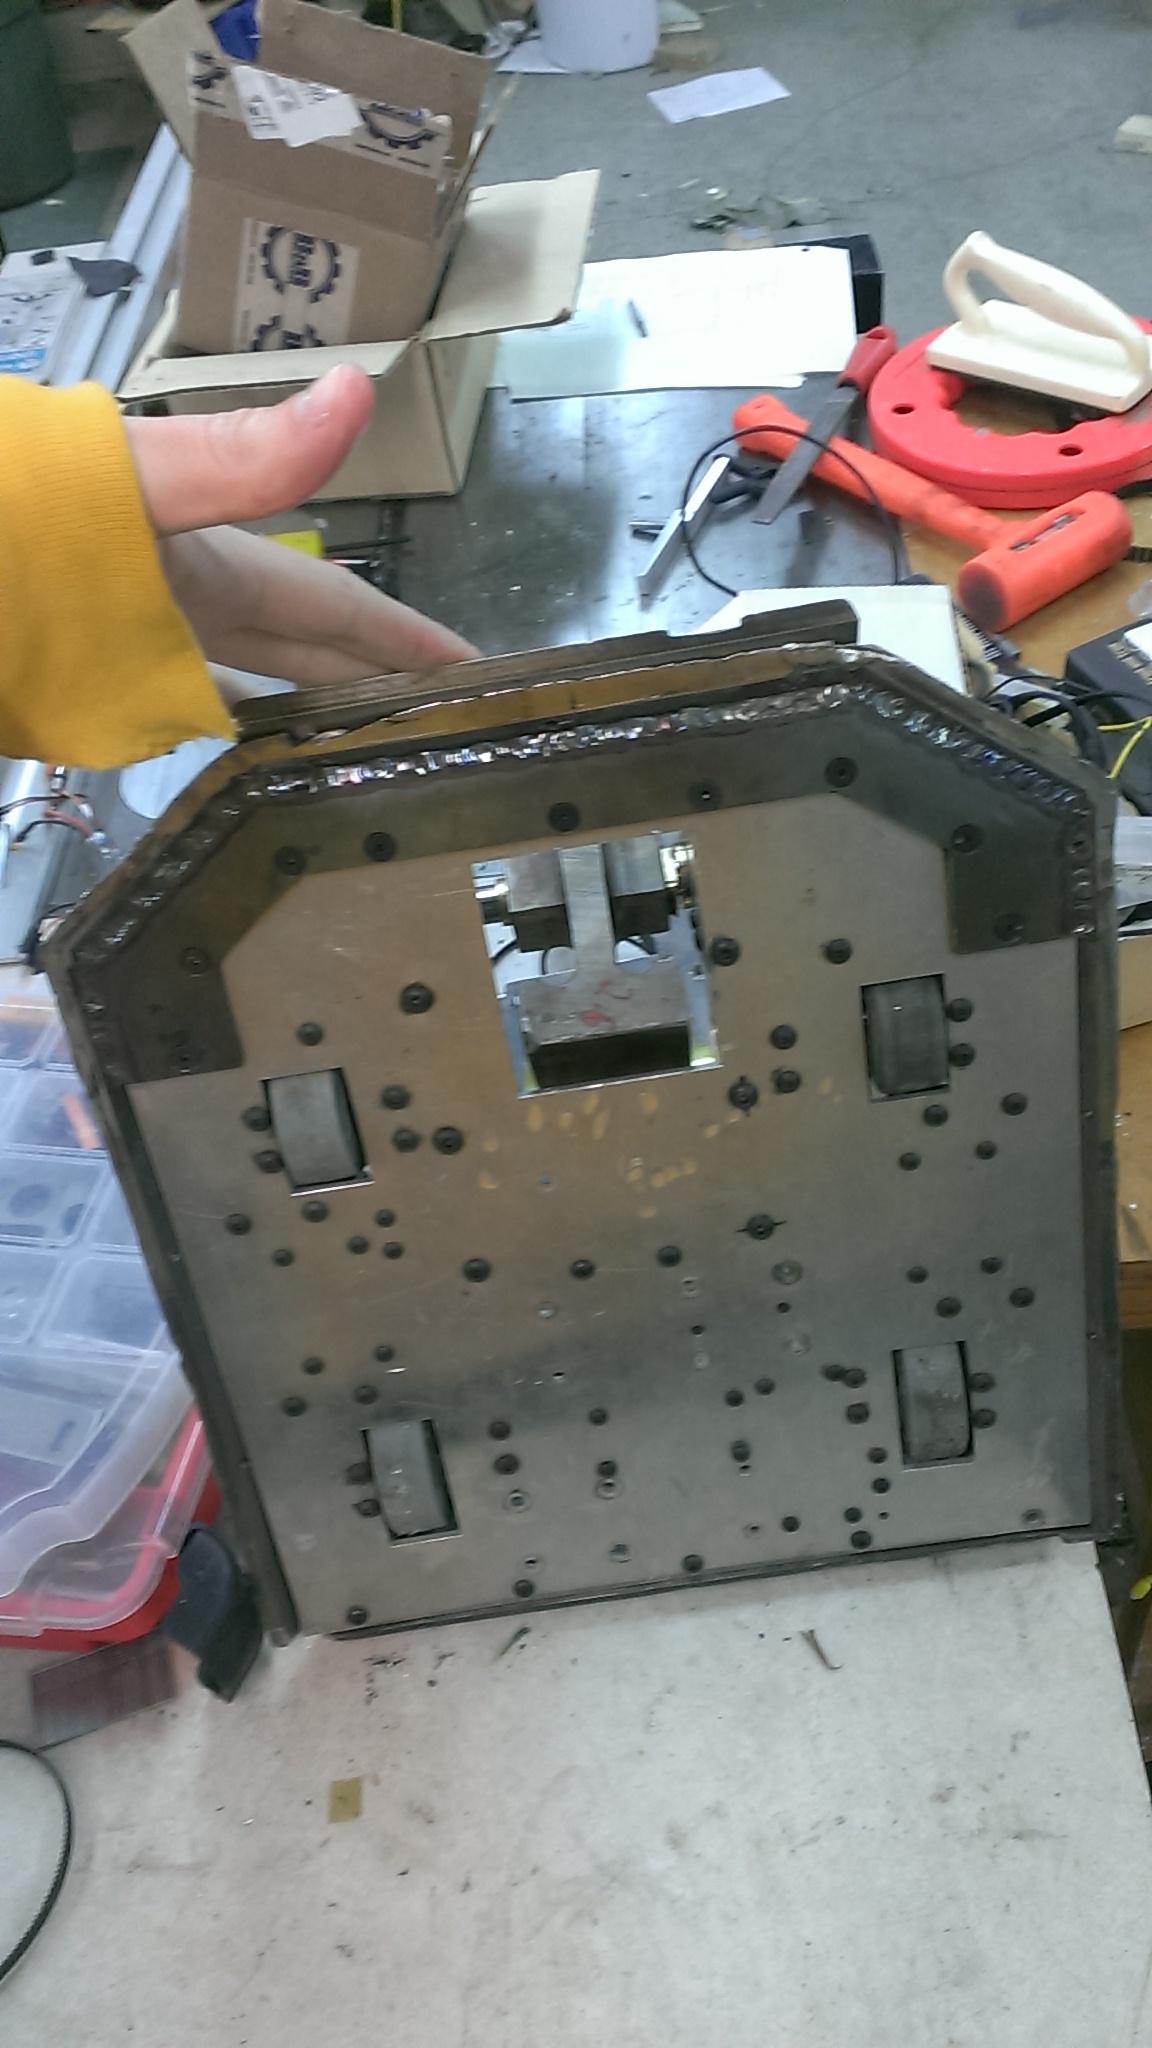 New 15 pound beater bot IMAG3307